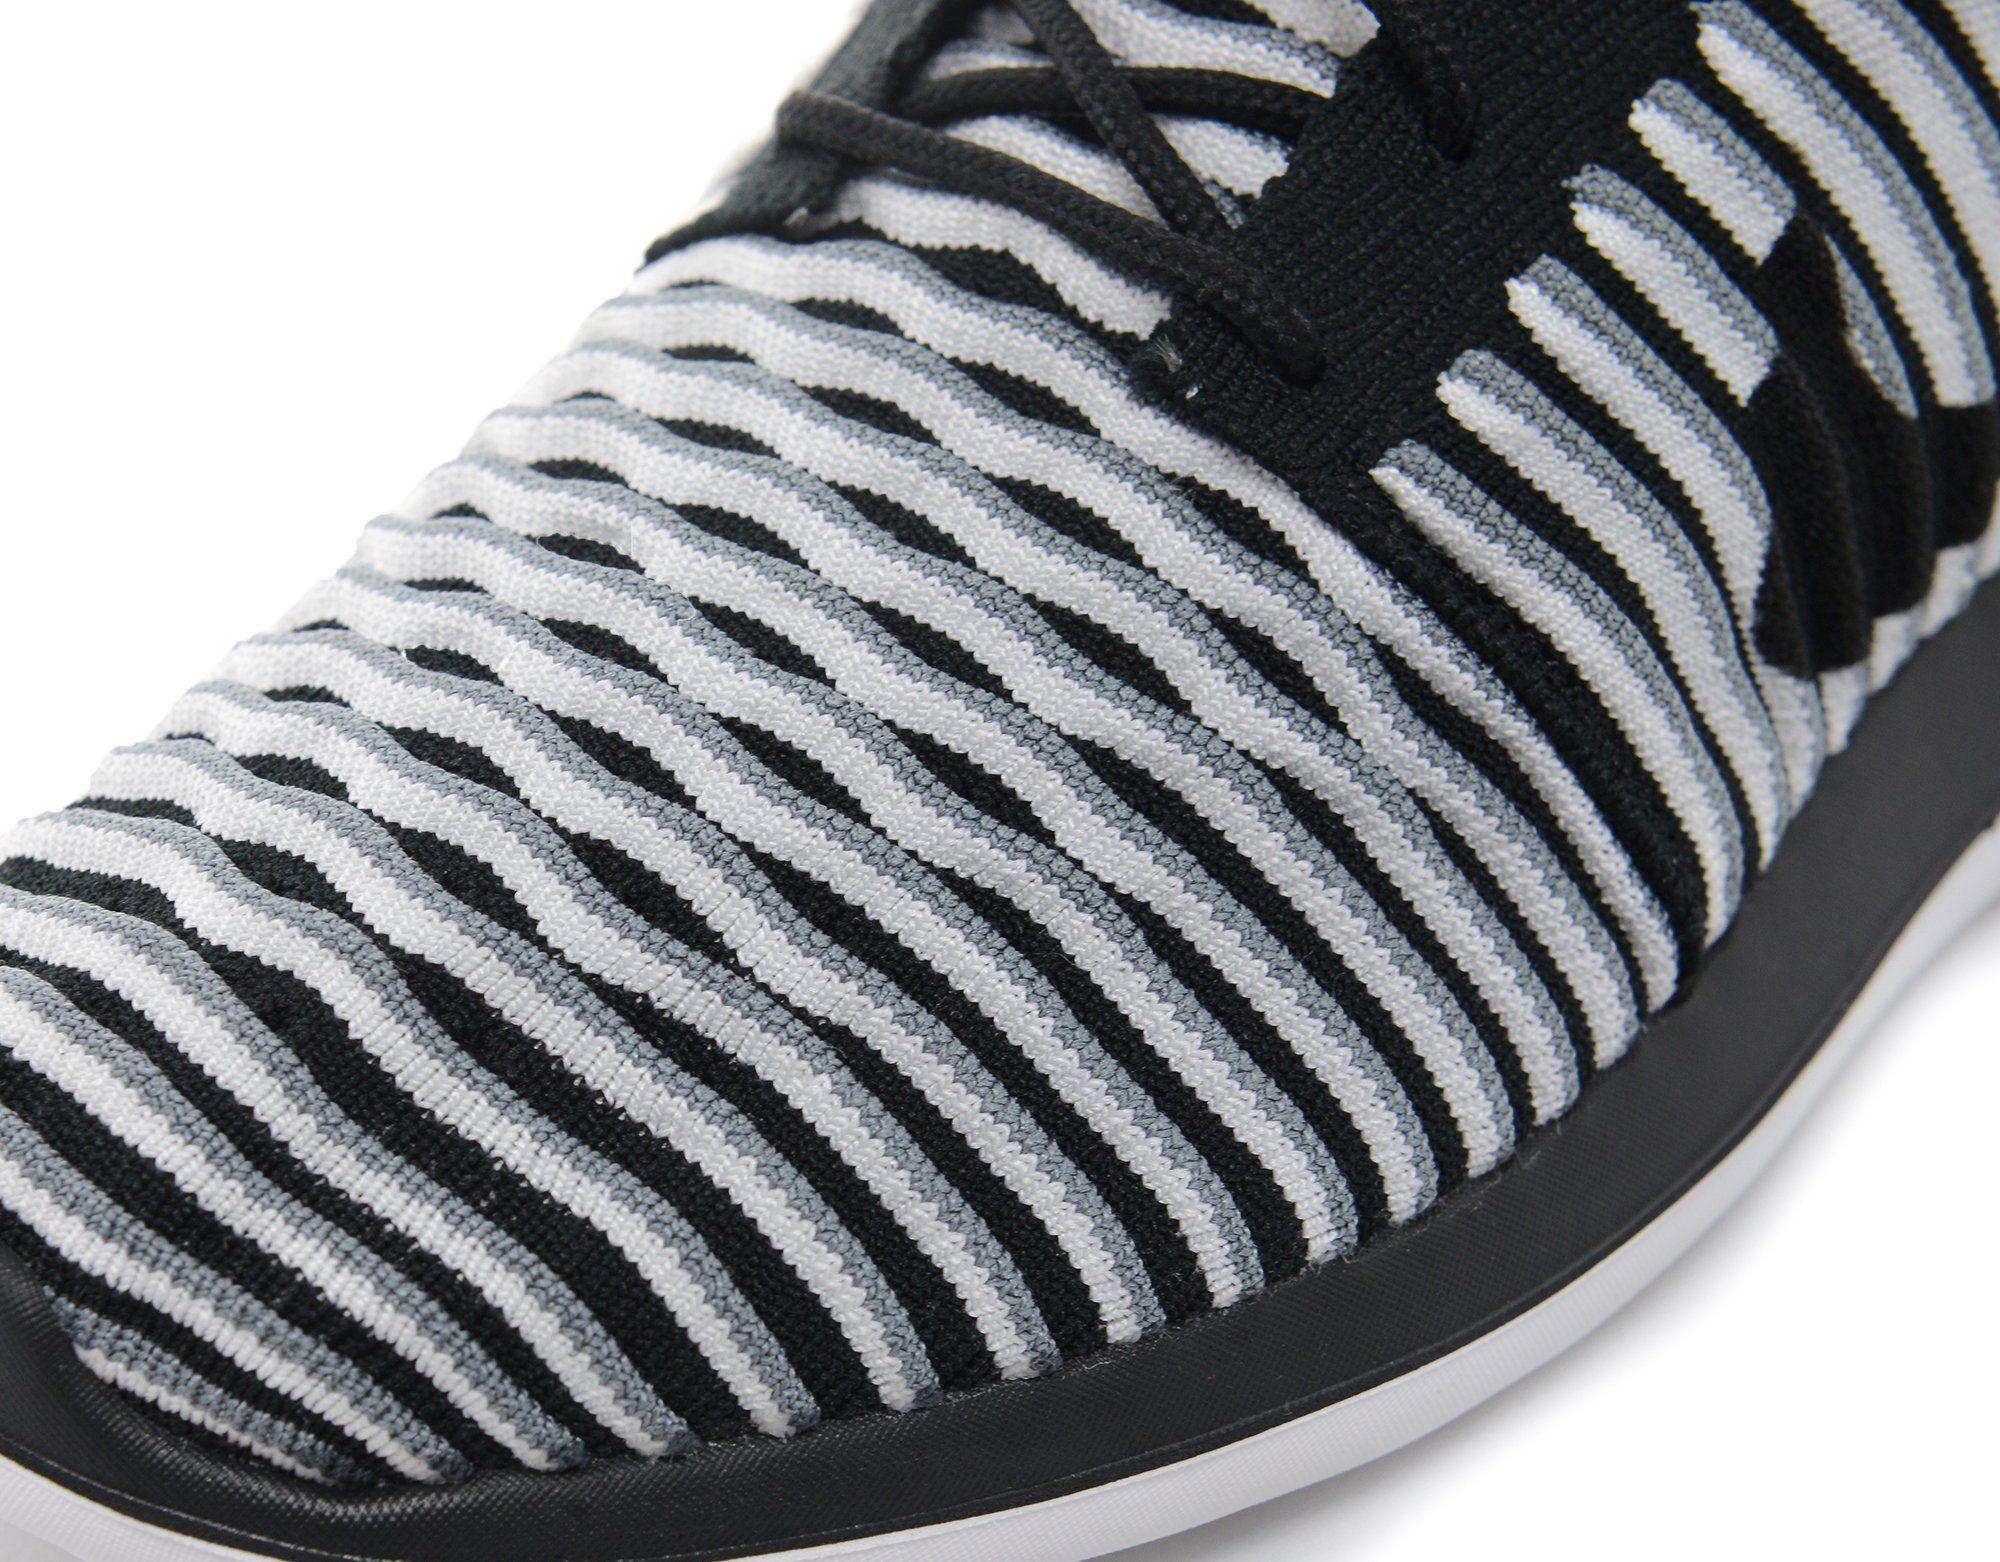 uqtyb Nike Roshe 2 Flyknit Women\'s | JD Sports